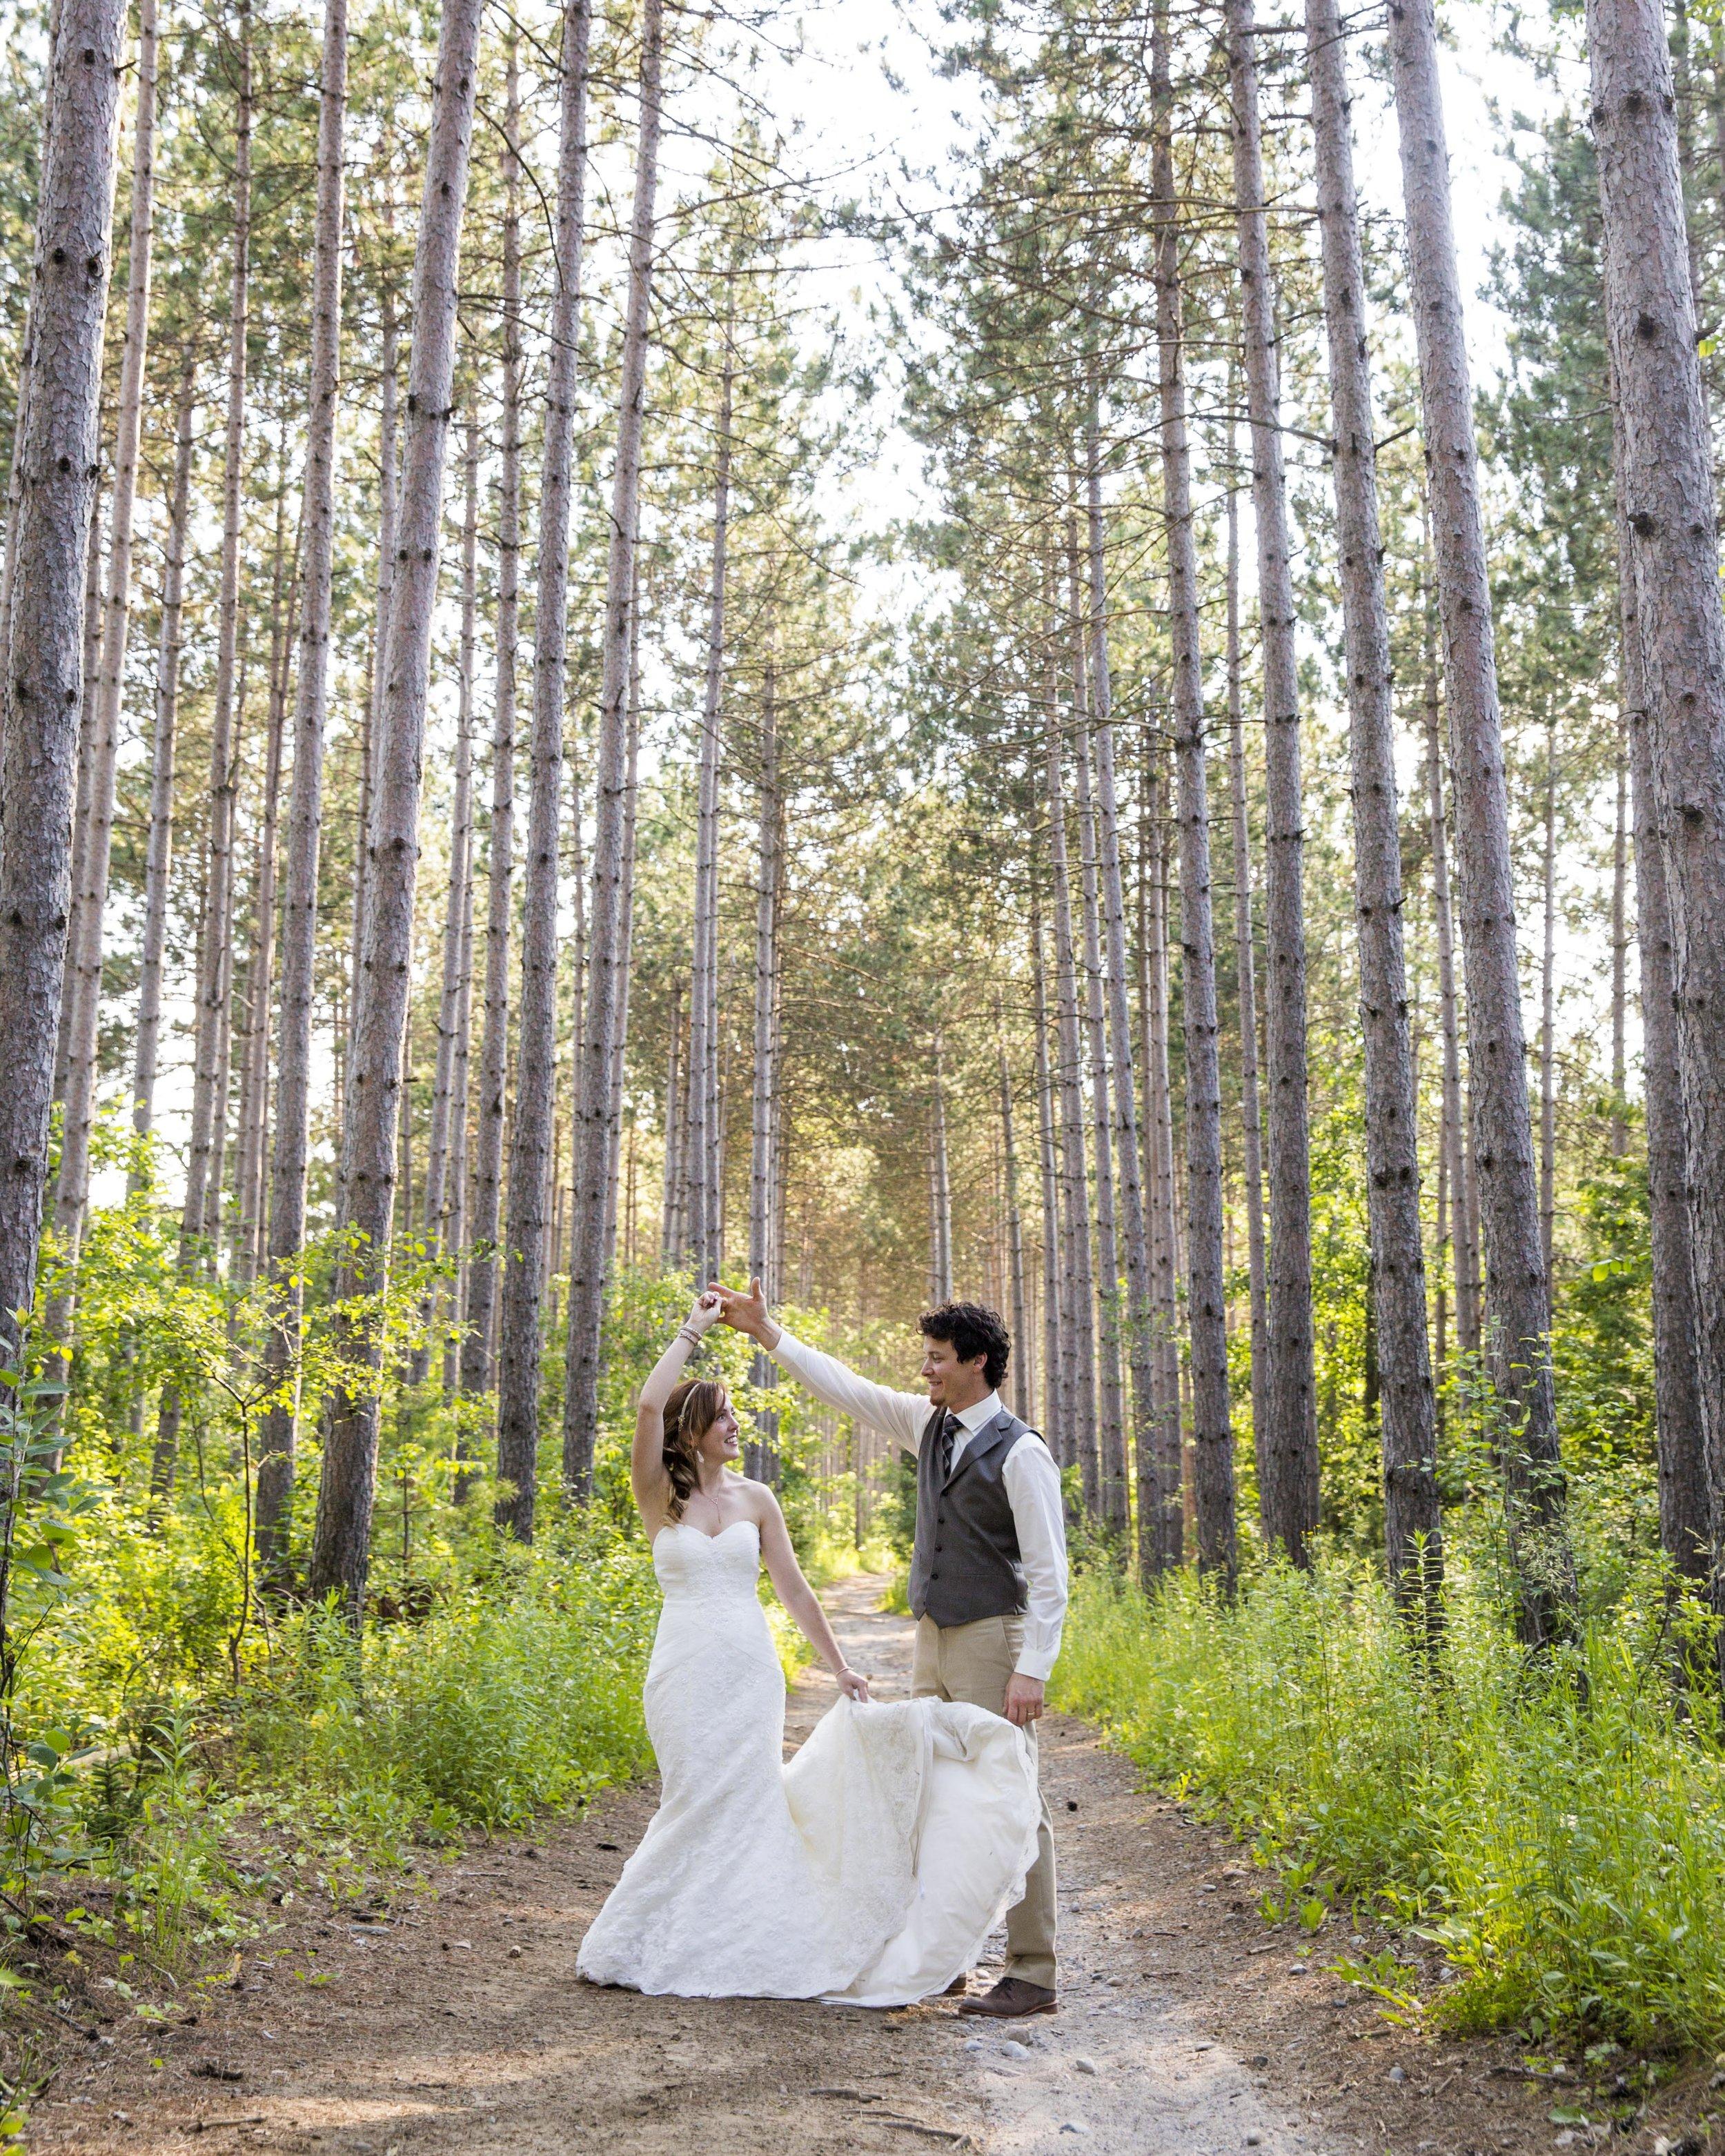 K&J-Wedding-JustJoy-July524.jpg